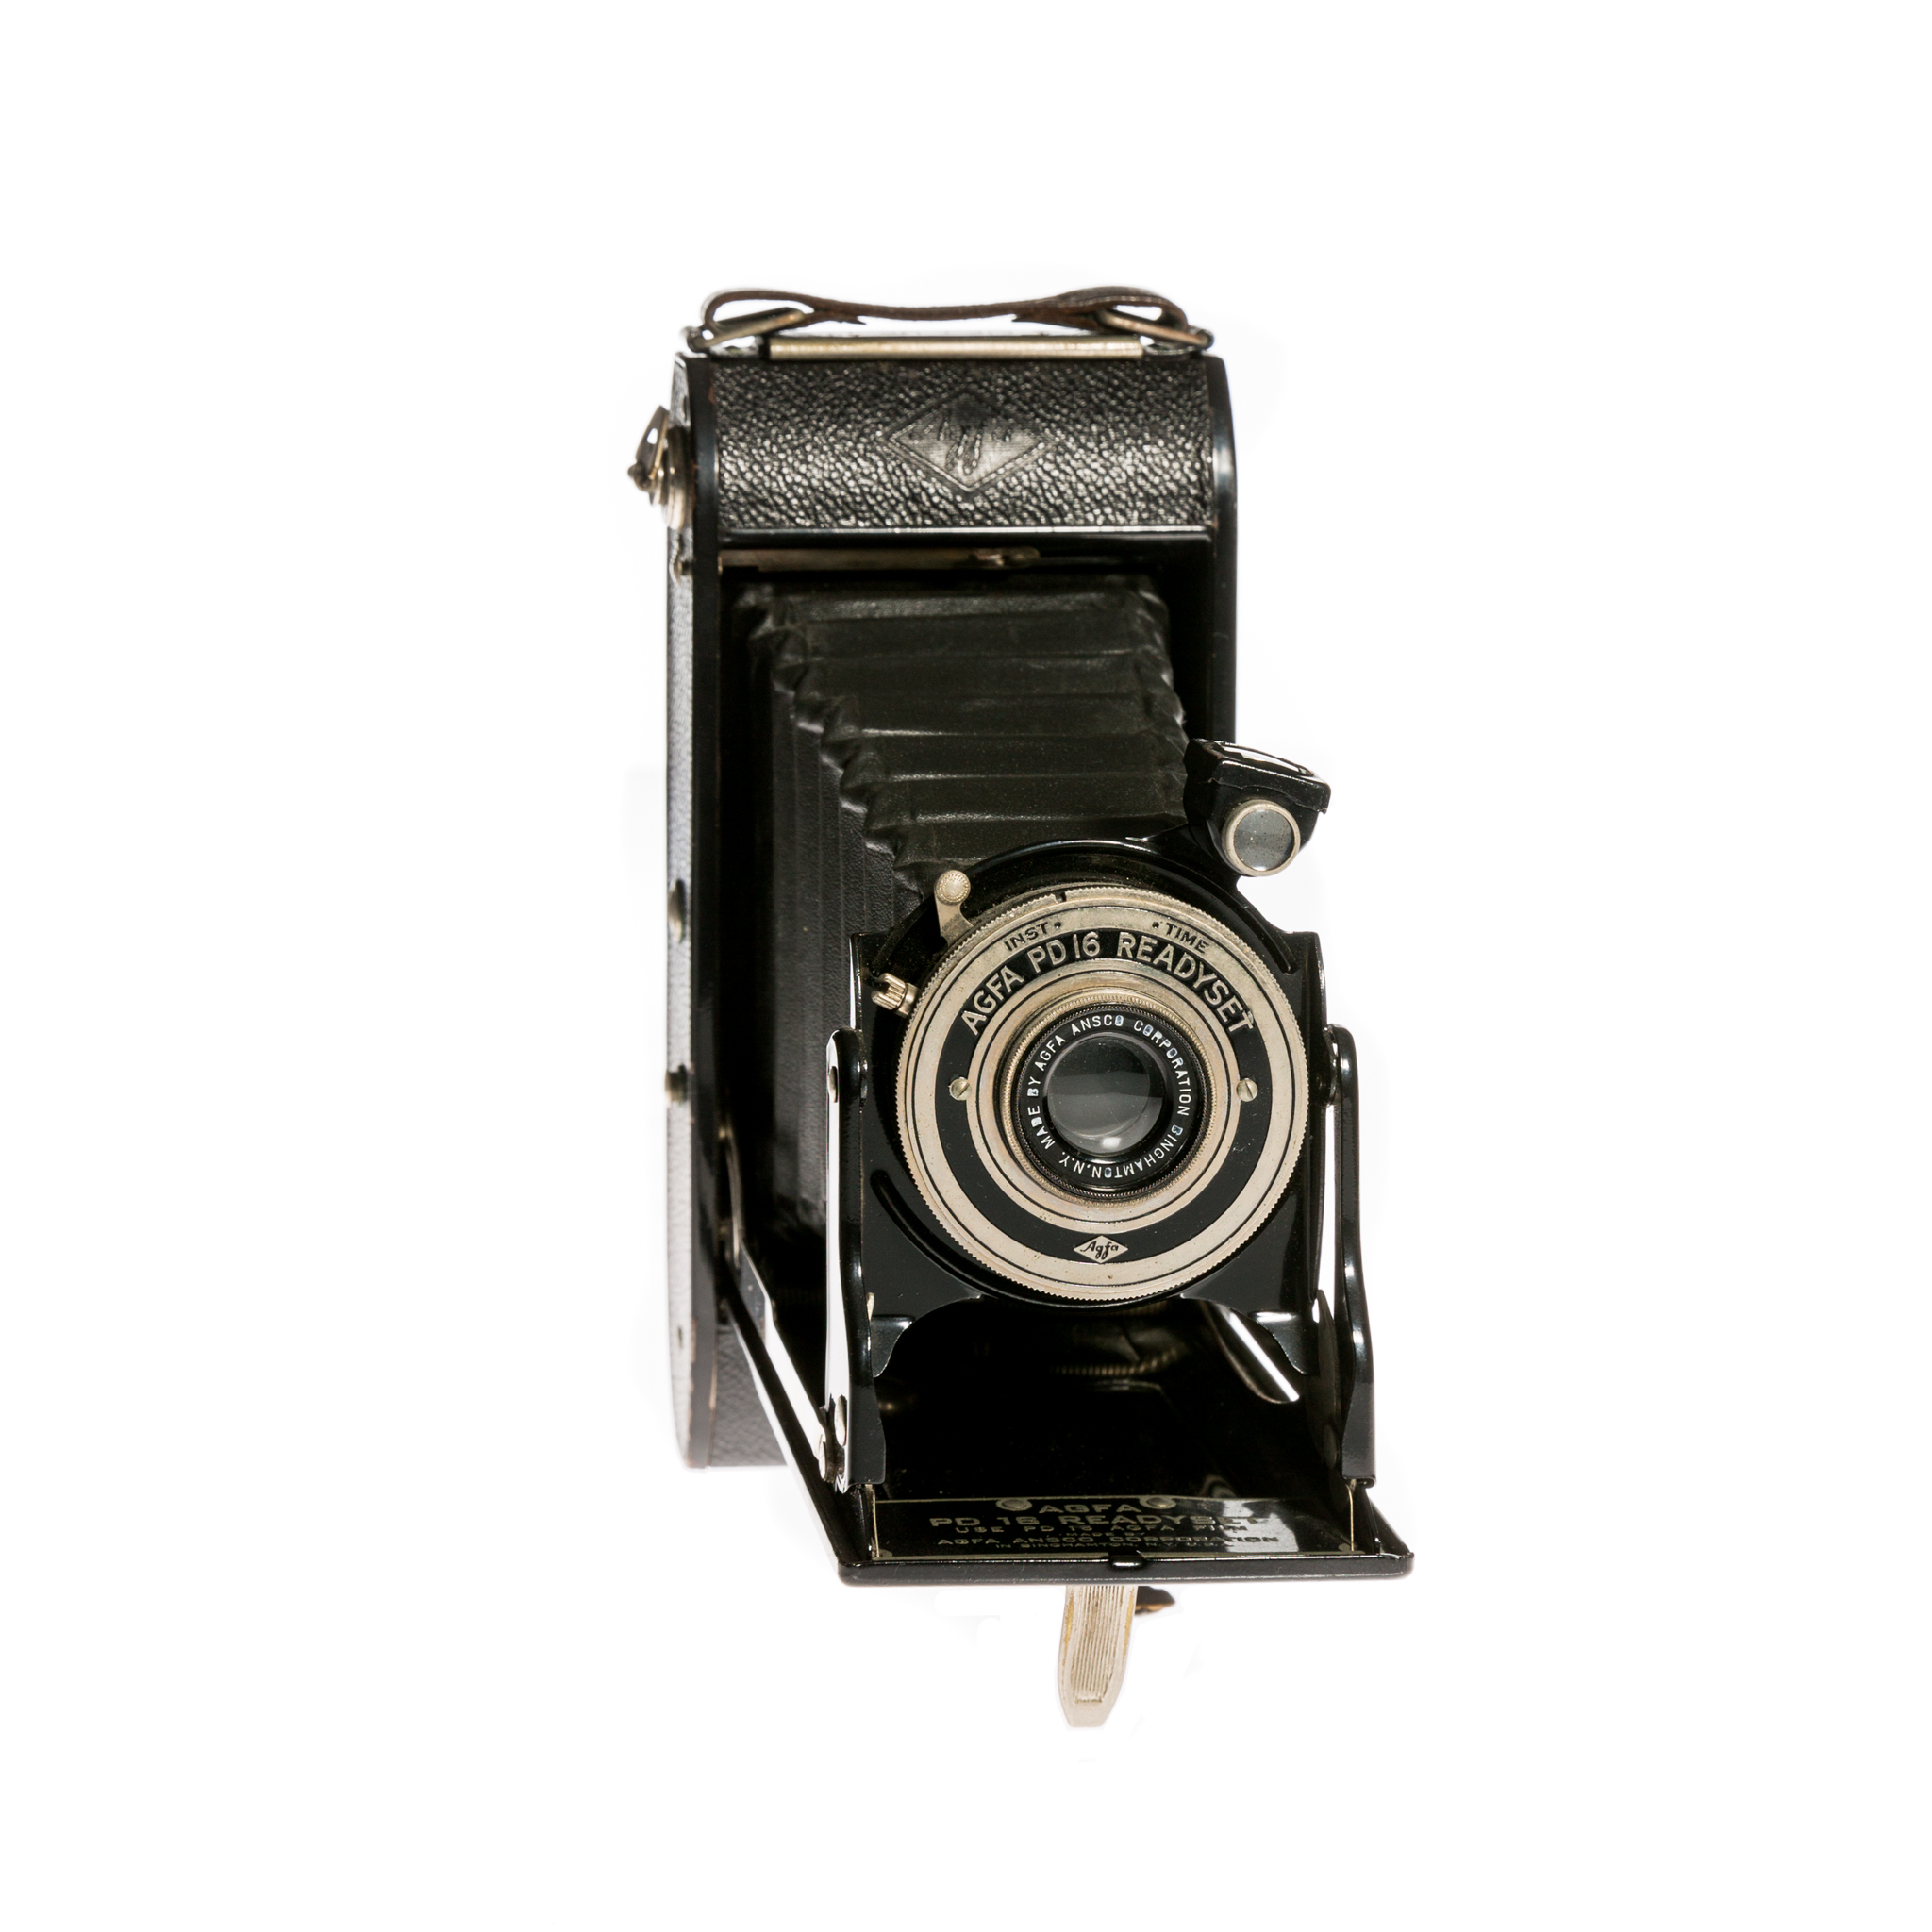 AGFA PD16 Readyset Folding Camera (1928)